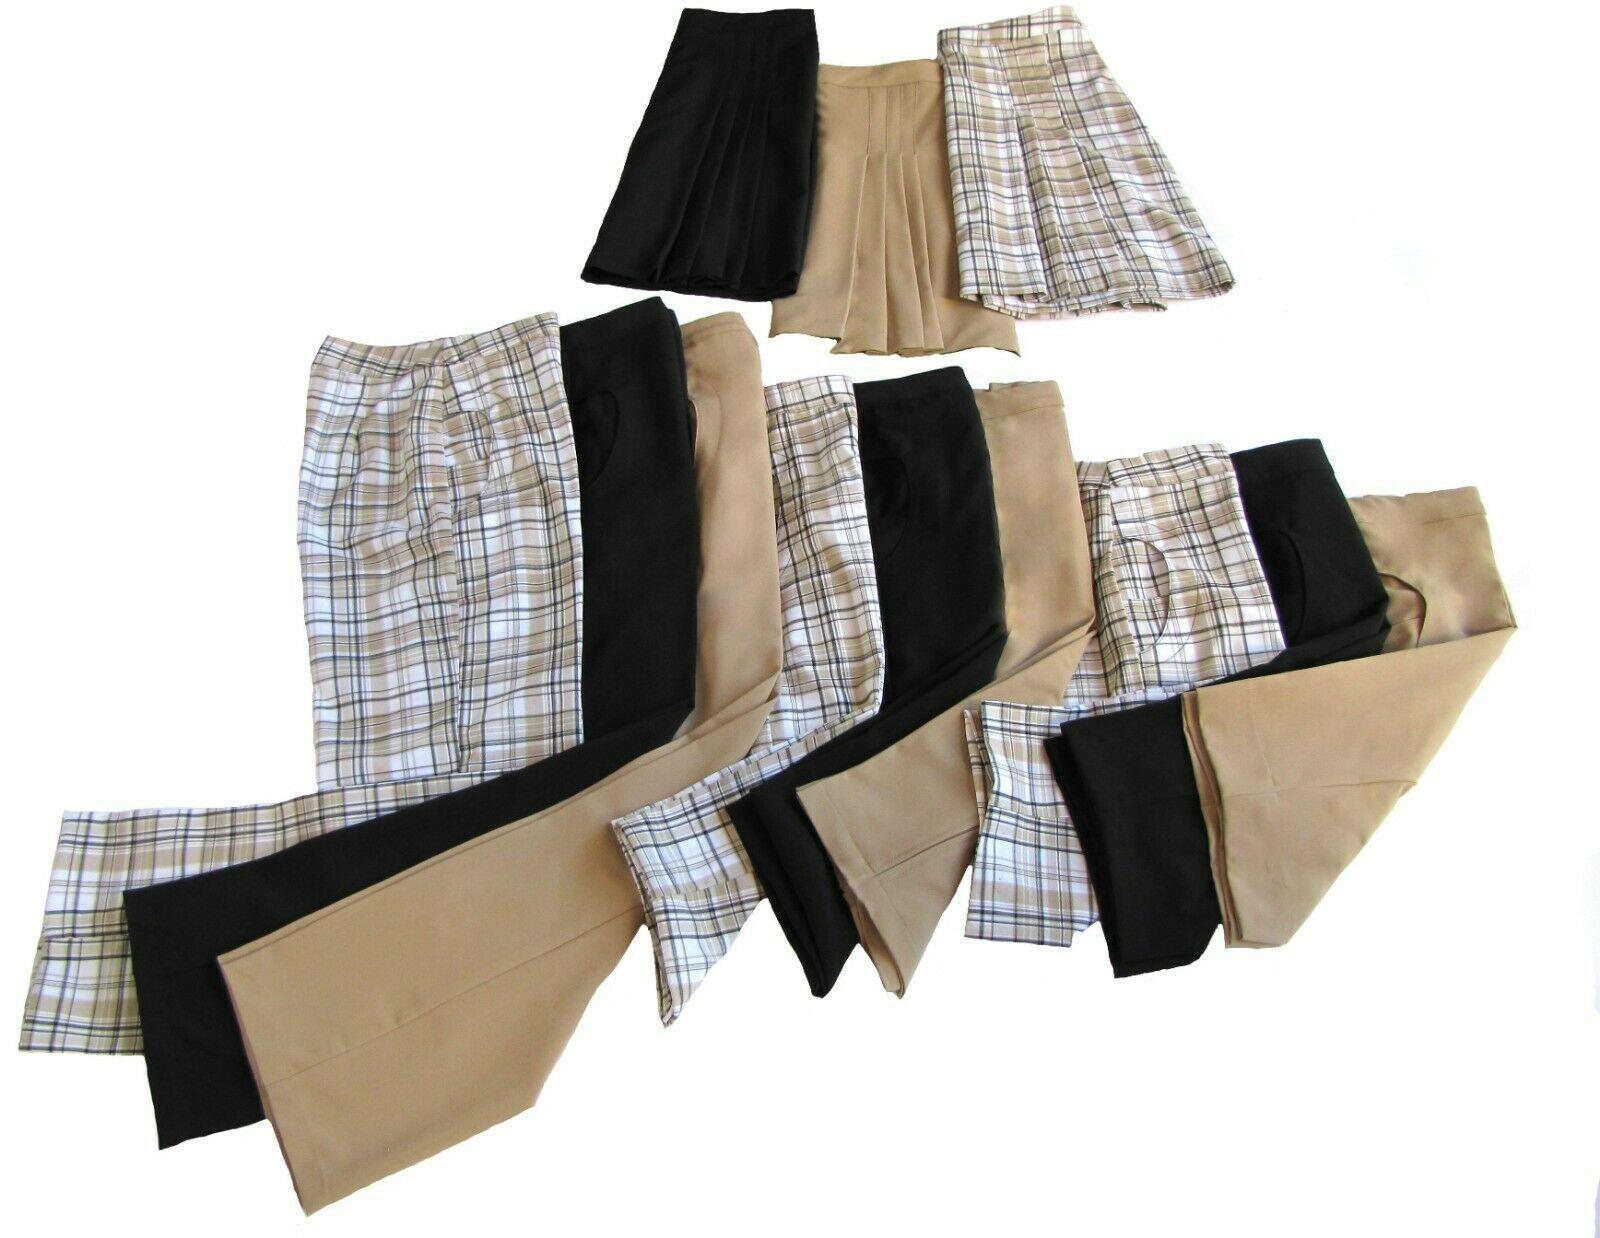 Stylish Women's Golf & Resort Black Long Sleeve Collar Top, Swarovski Buttons  image 8